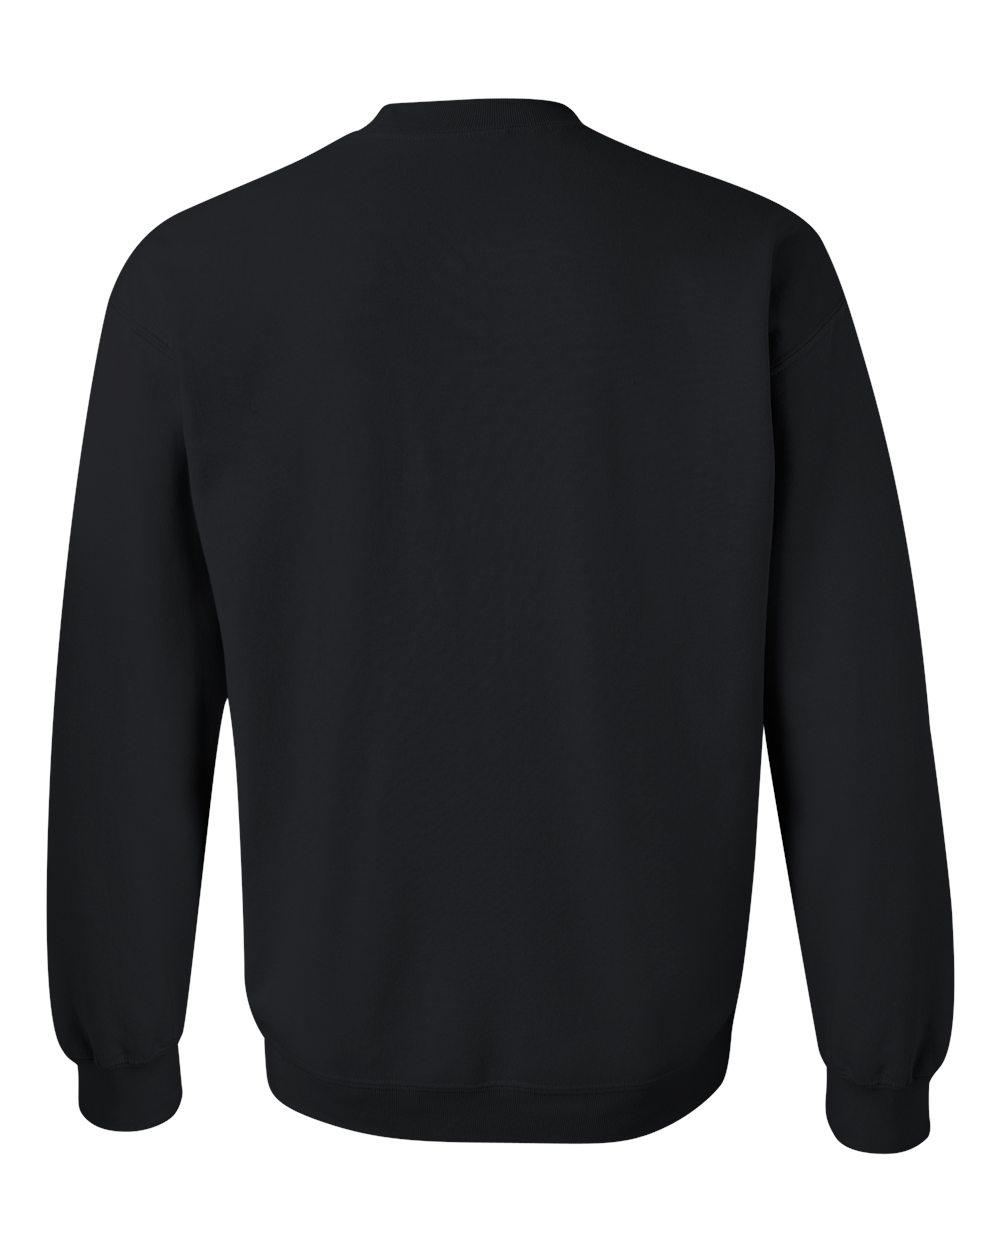 crewneck sweatshirt template front and back wwwimgkid